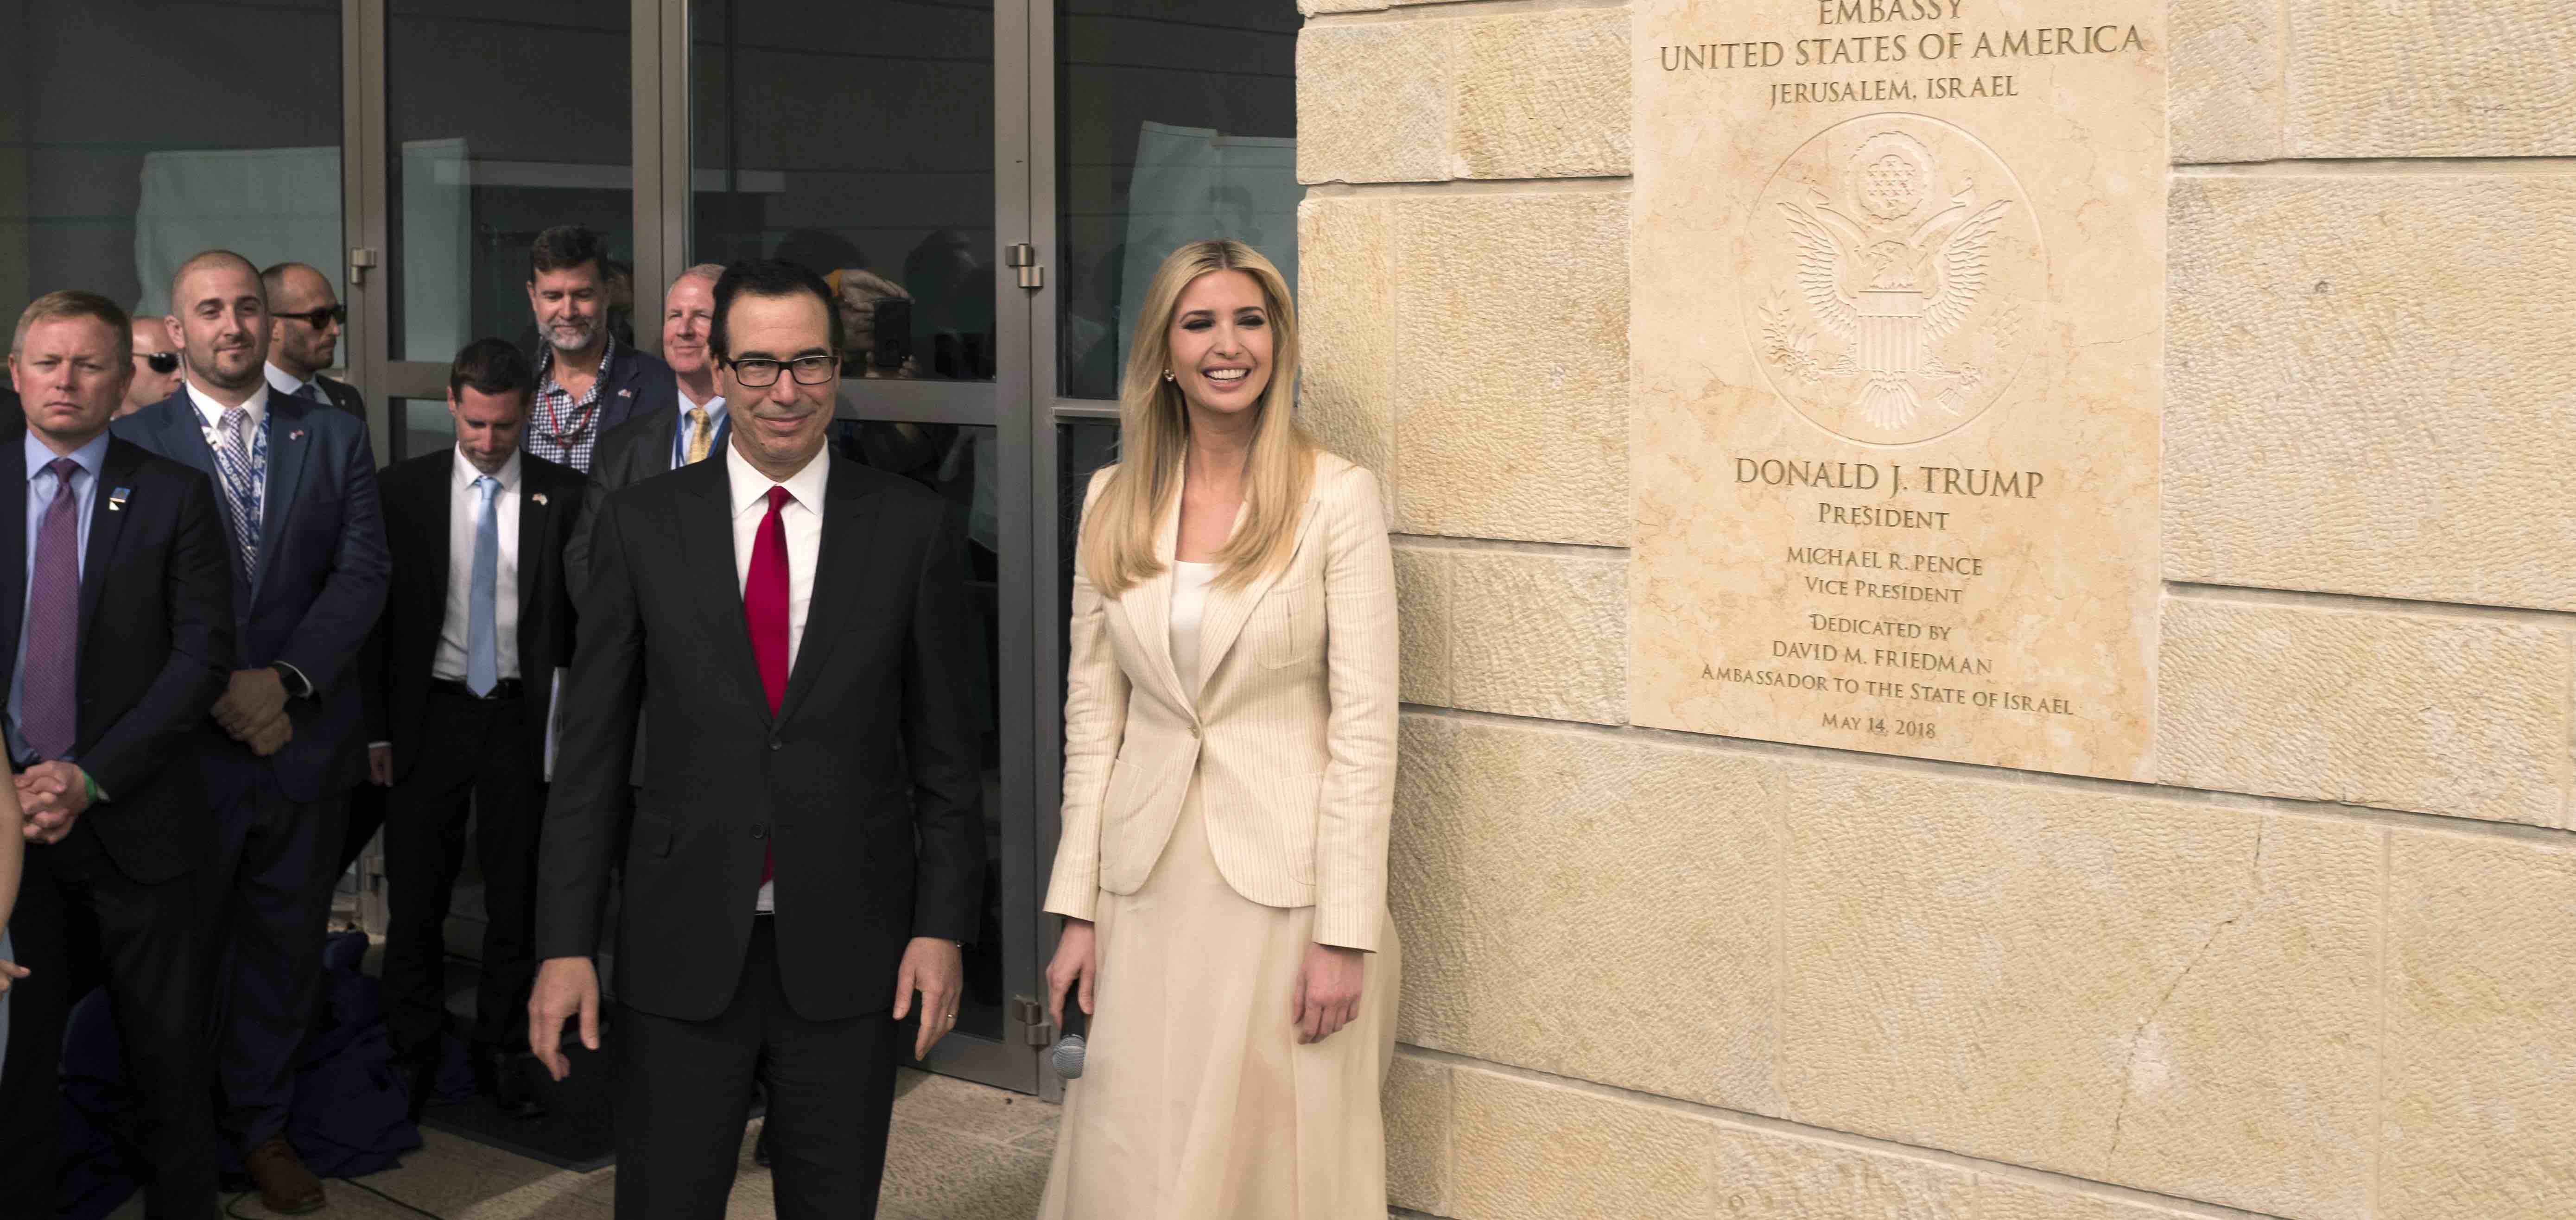 White House Senior Advisor Ivanka Trump opening the US Embassy in Jerusalem (Photo: Lior Mizrahi/Getty)